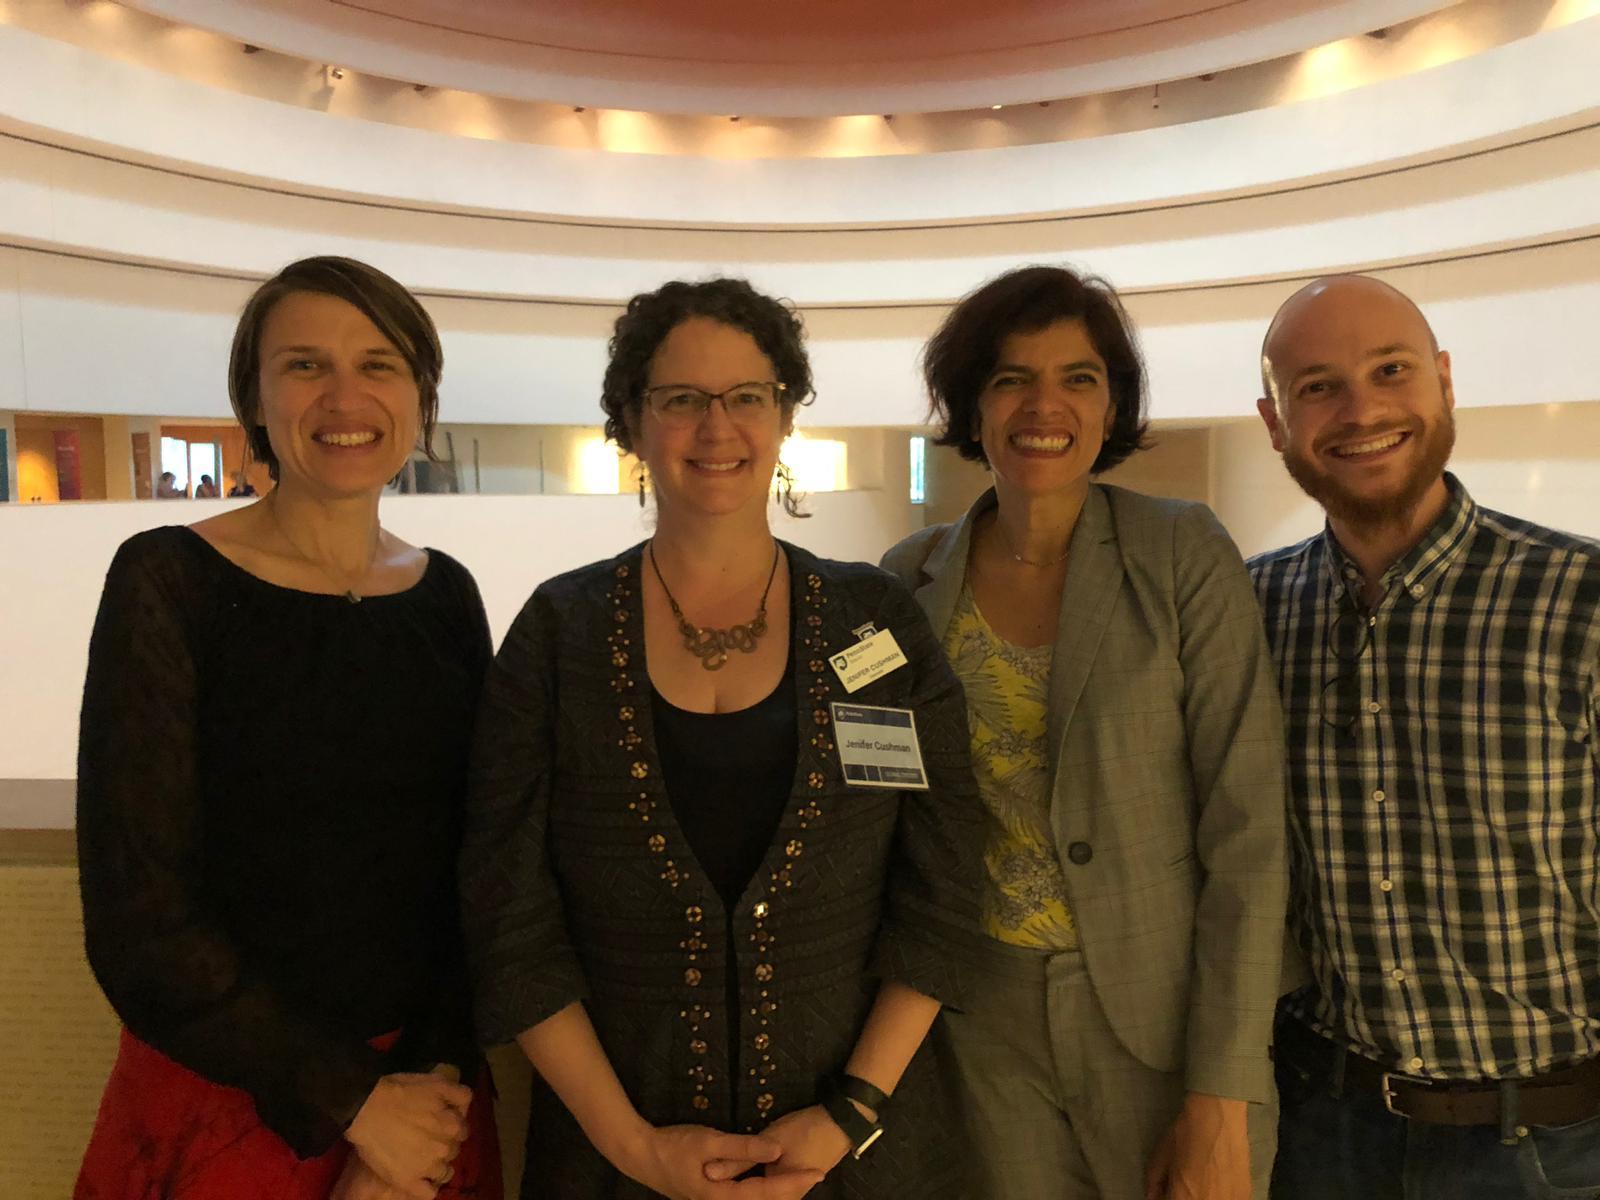 Sonia Lehman-Frisch (UPN), Jenifer Cushman (Penn State Beaver), Mariana Pujol (UPN), Valentin Zero (UPN)